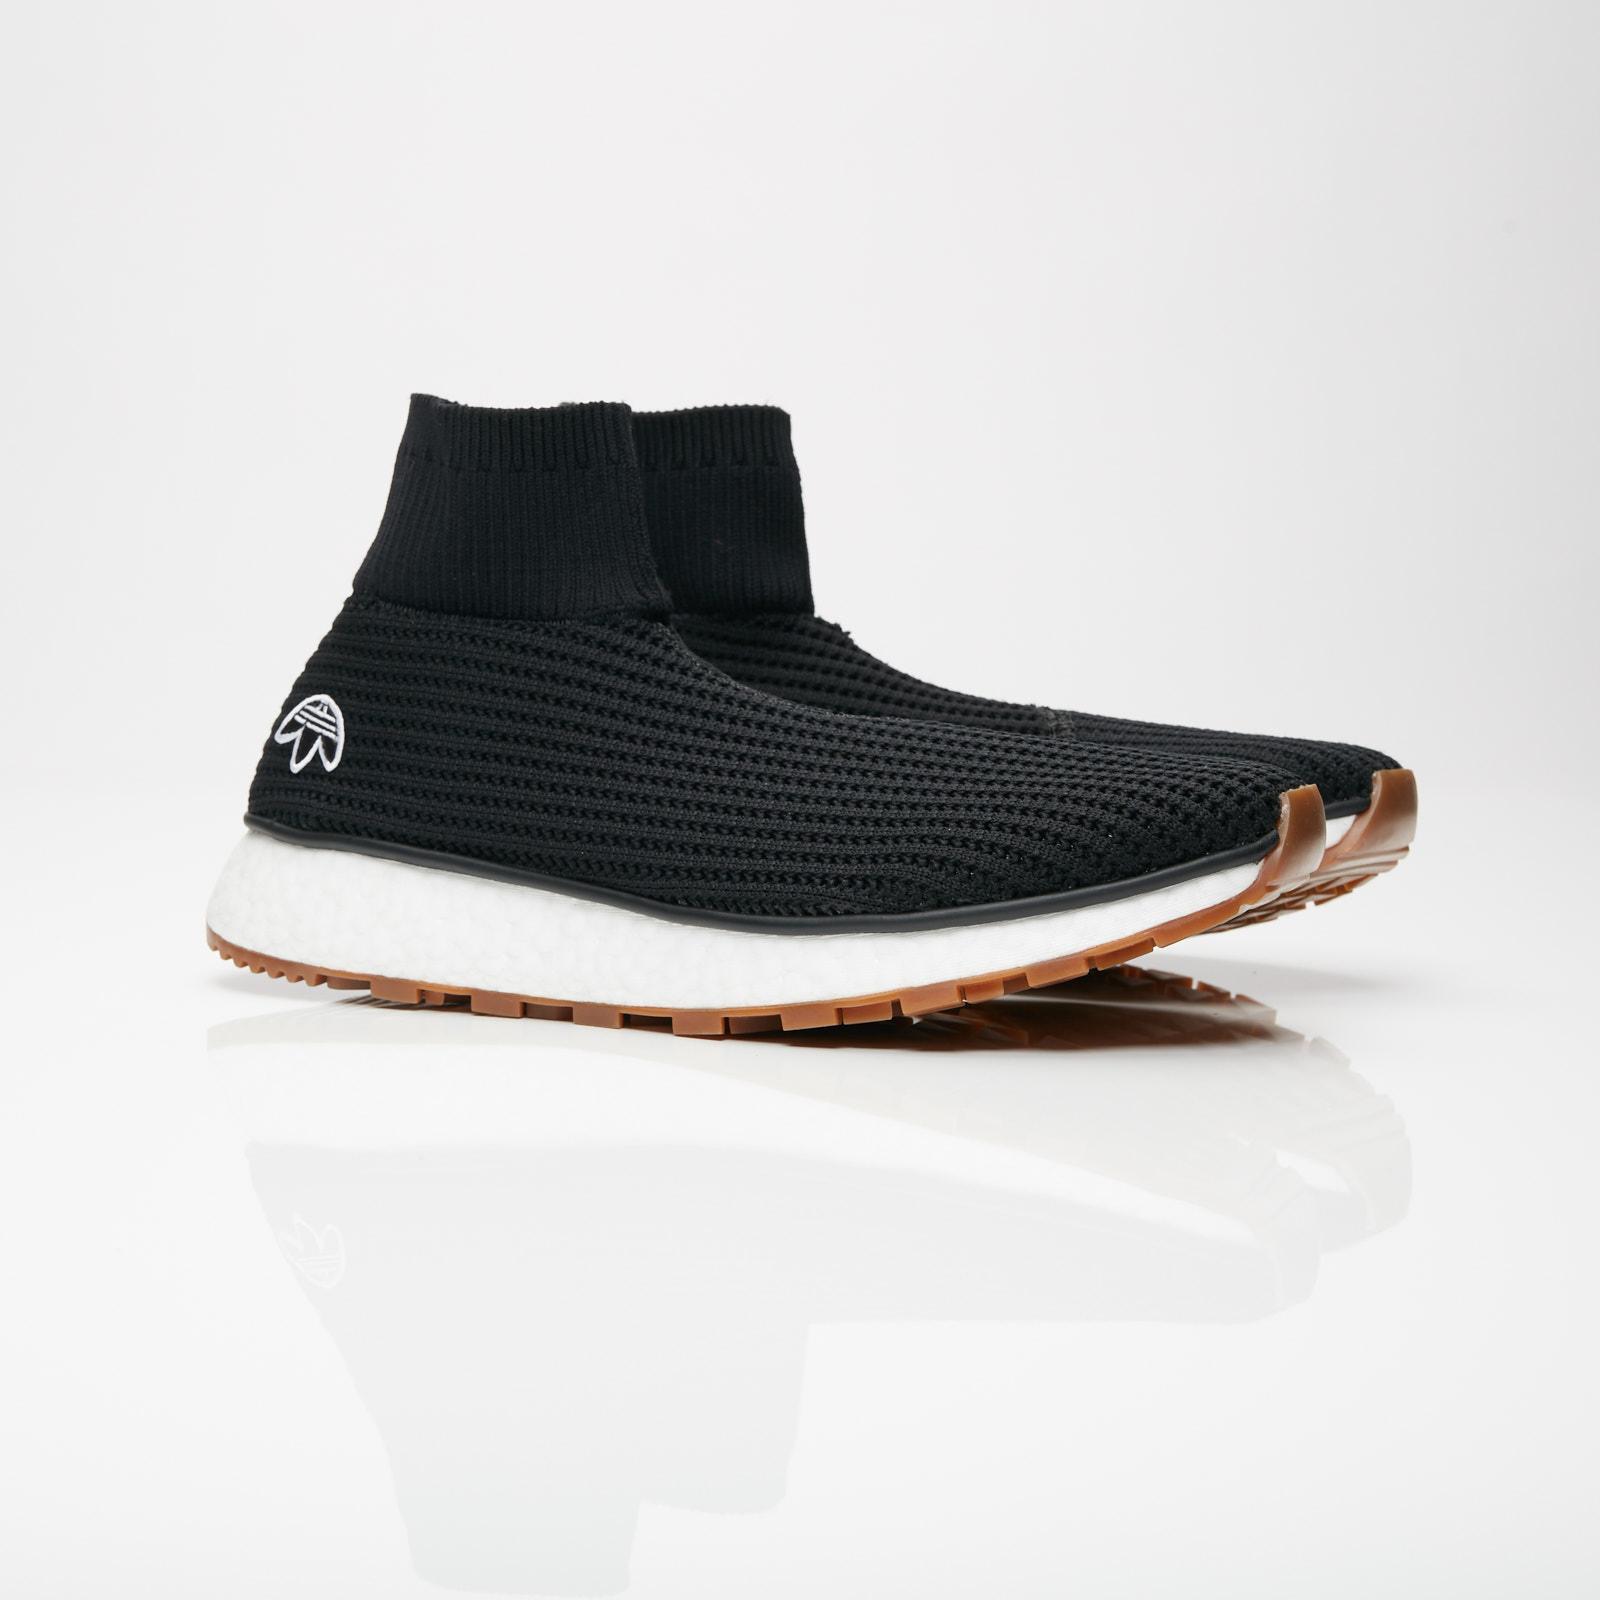 b9dbd2829de4 adidas originals x alexander wang run clean off 53% - www.boutique ...